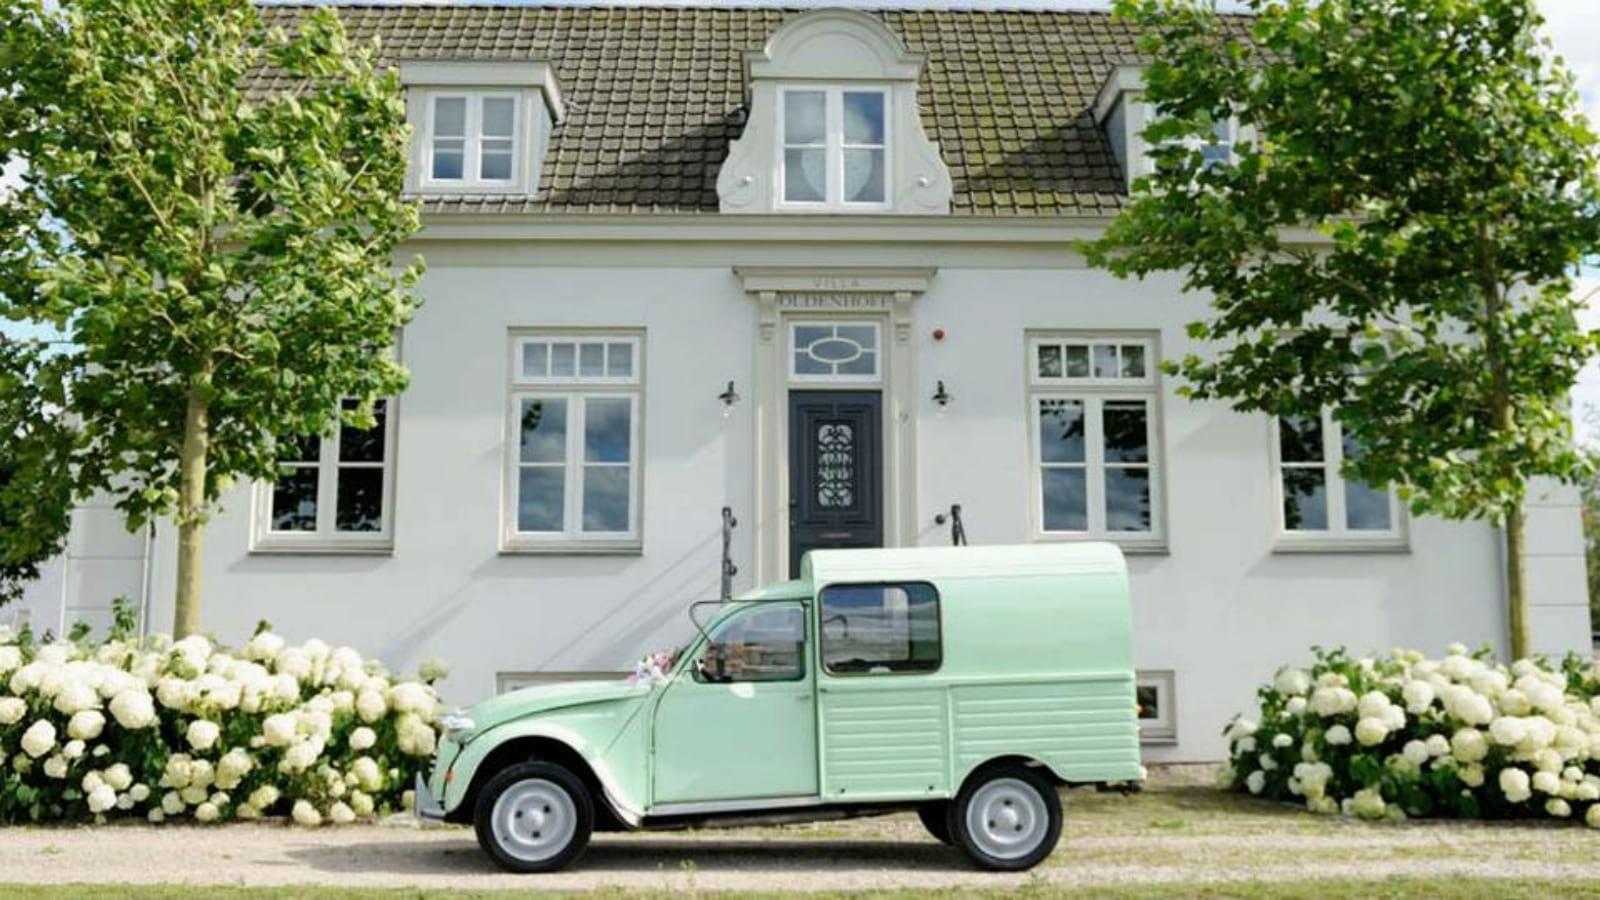 Supertrips - Authentieke villa overnachting